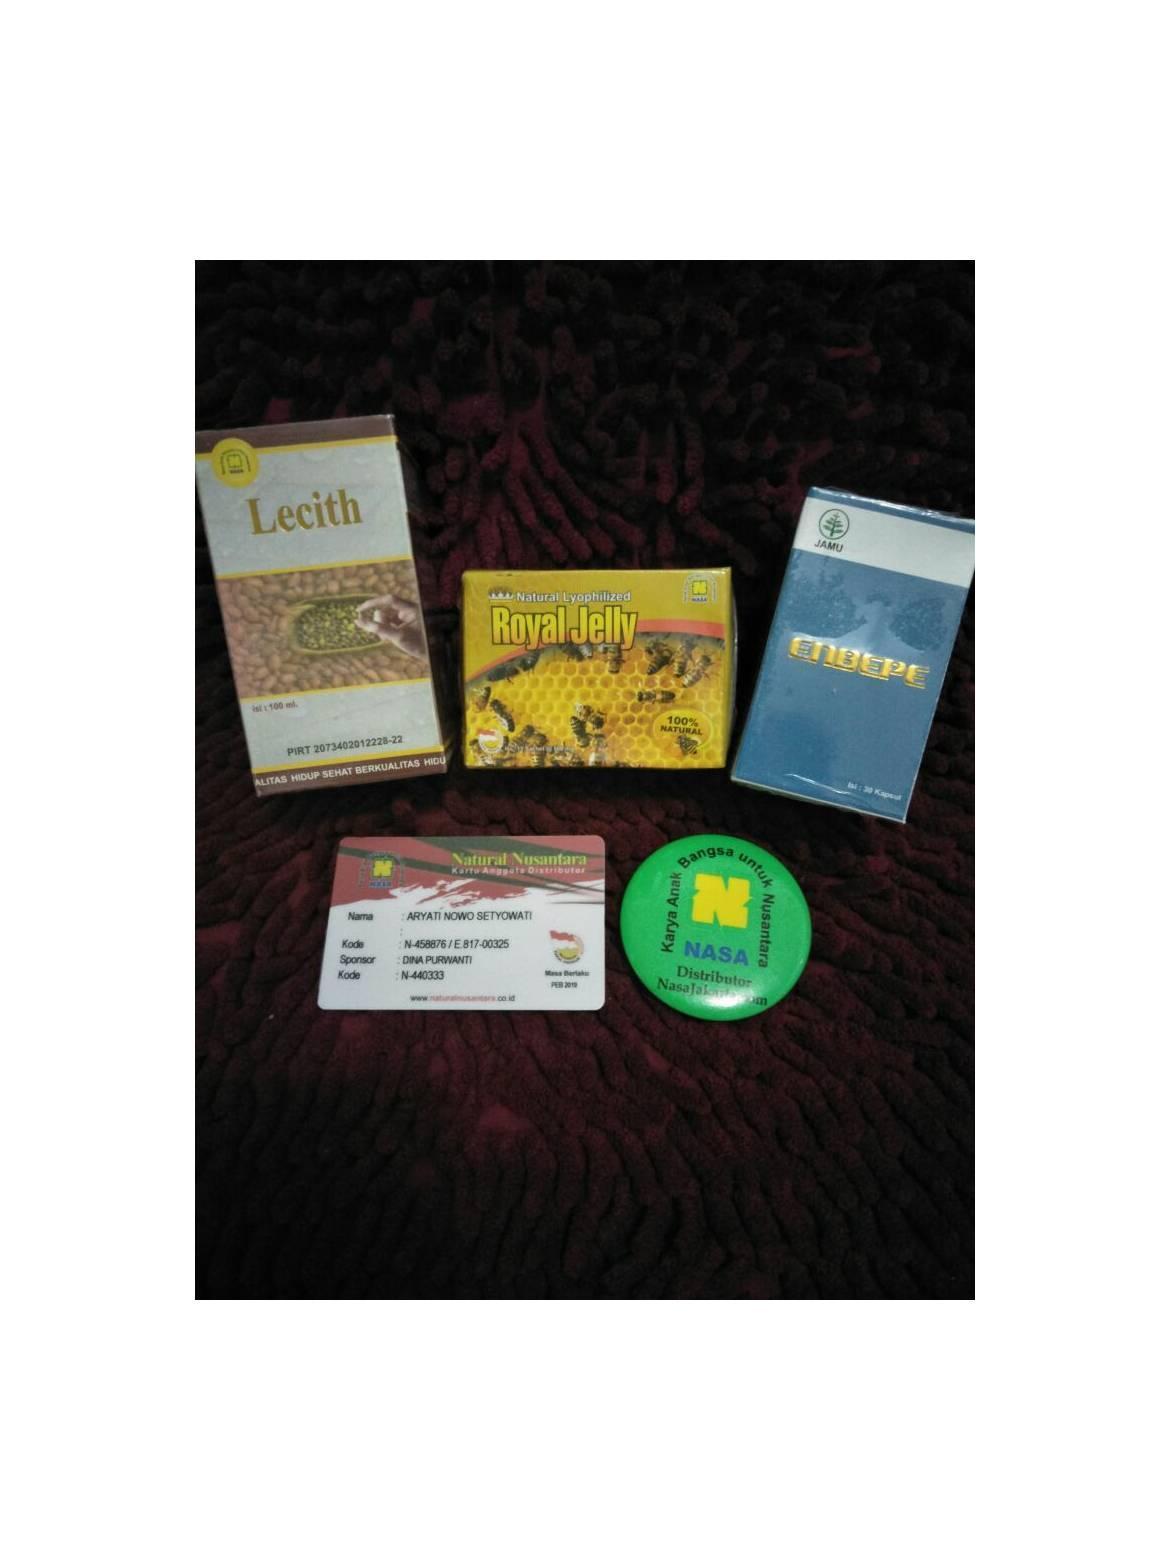 Obat Strok Nasa/Darah Tinggi/Obat Pikun/Agen Nasa Jakarta 1